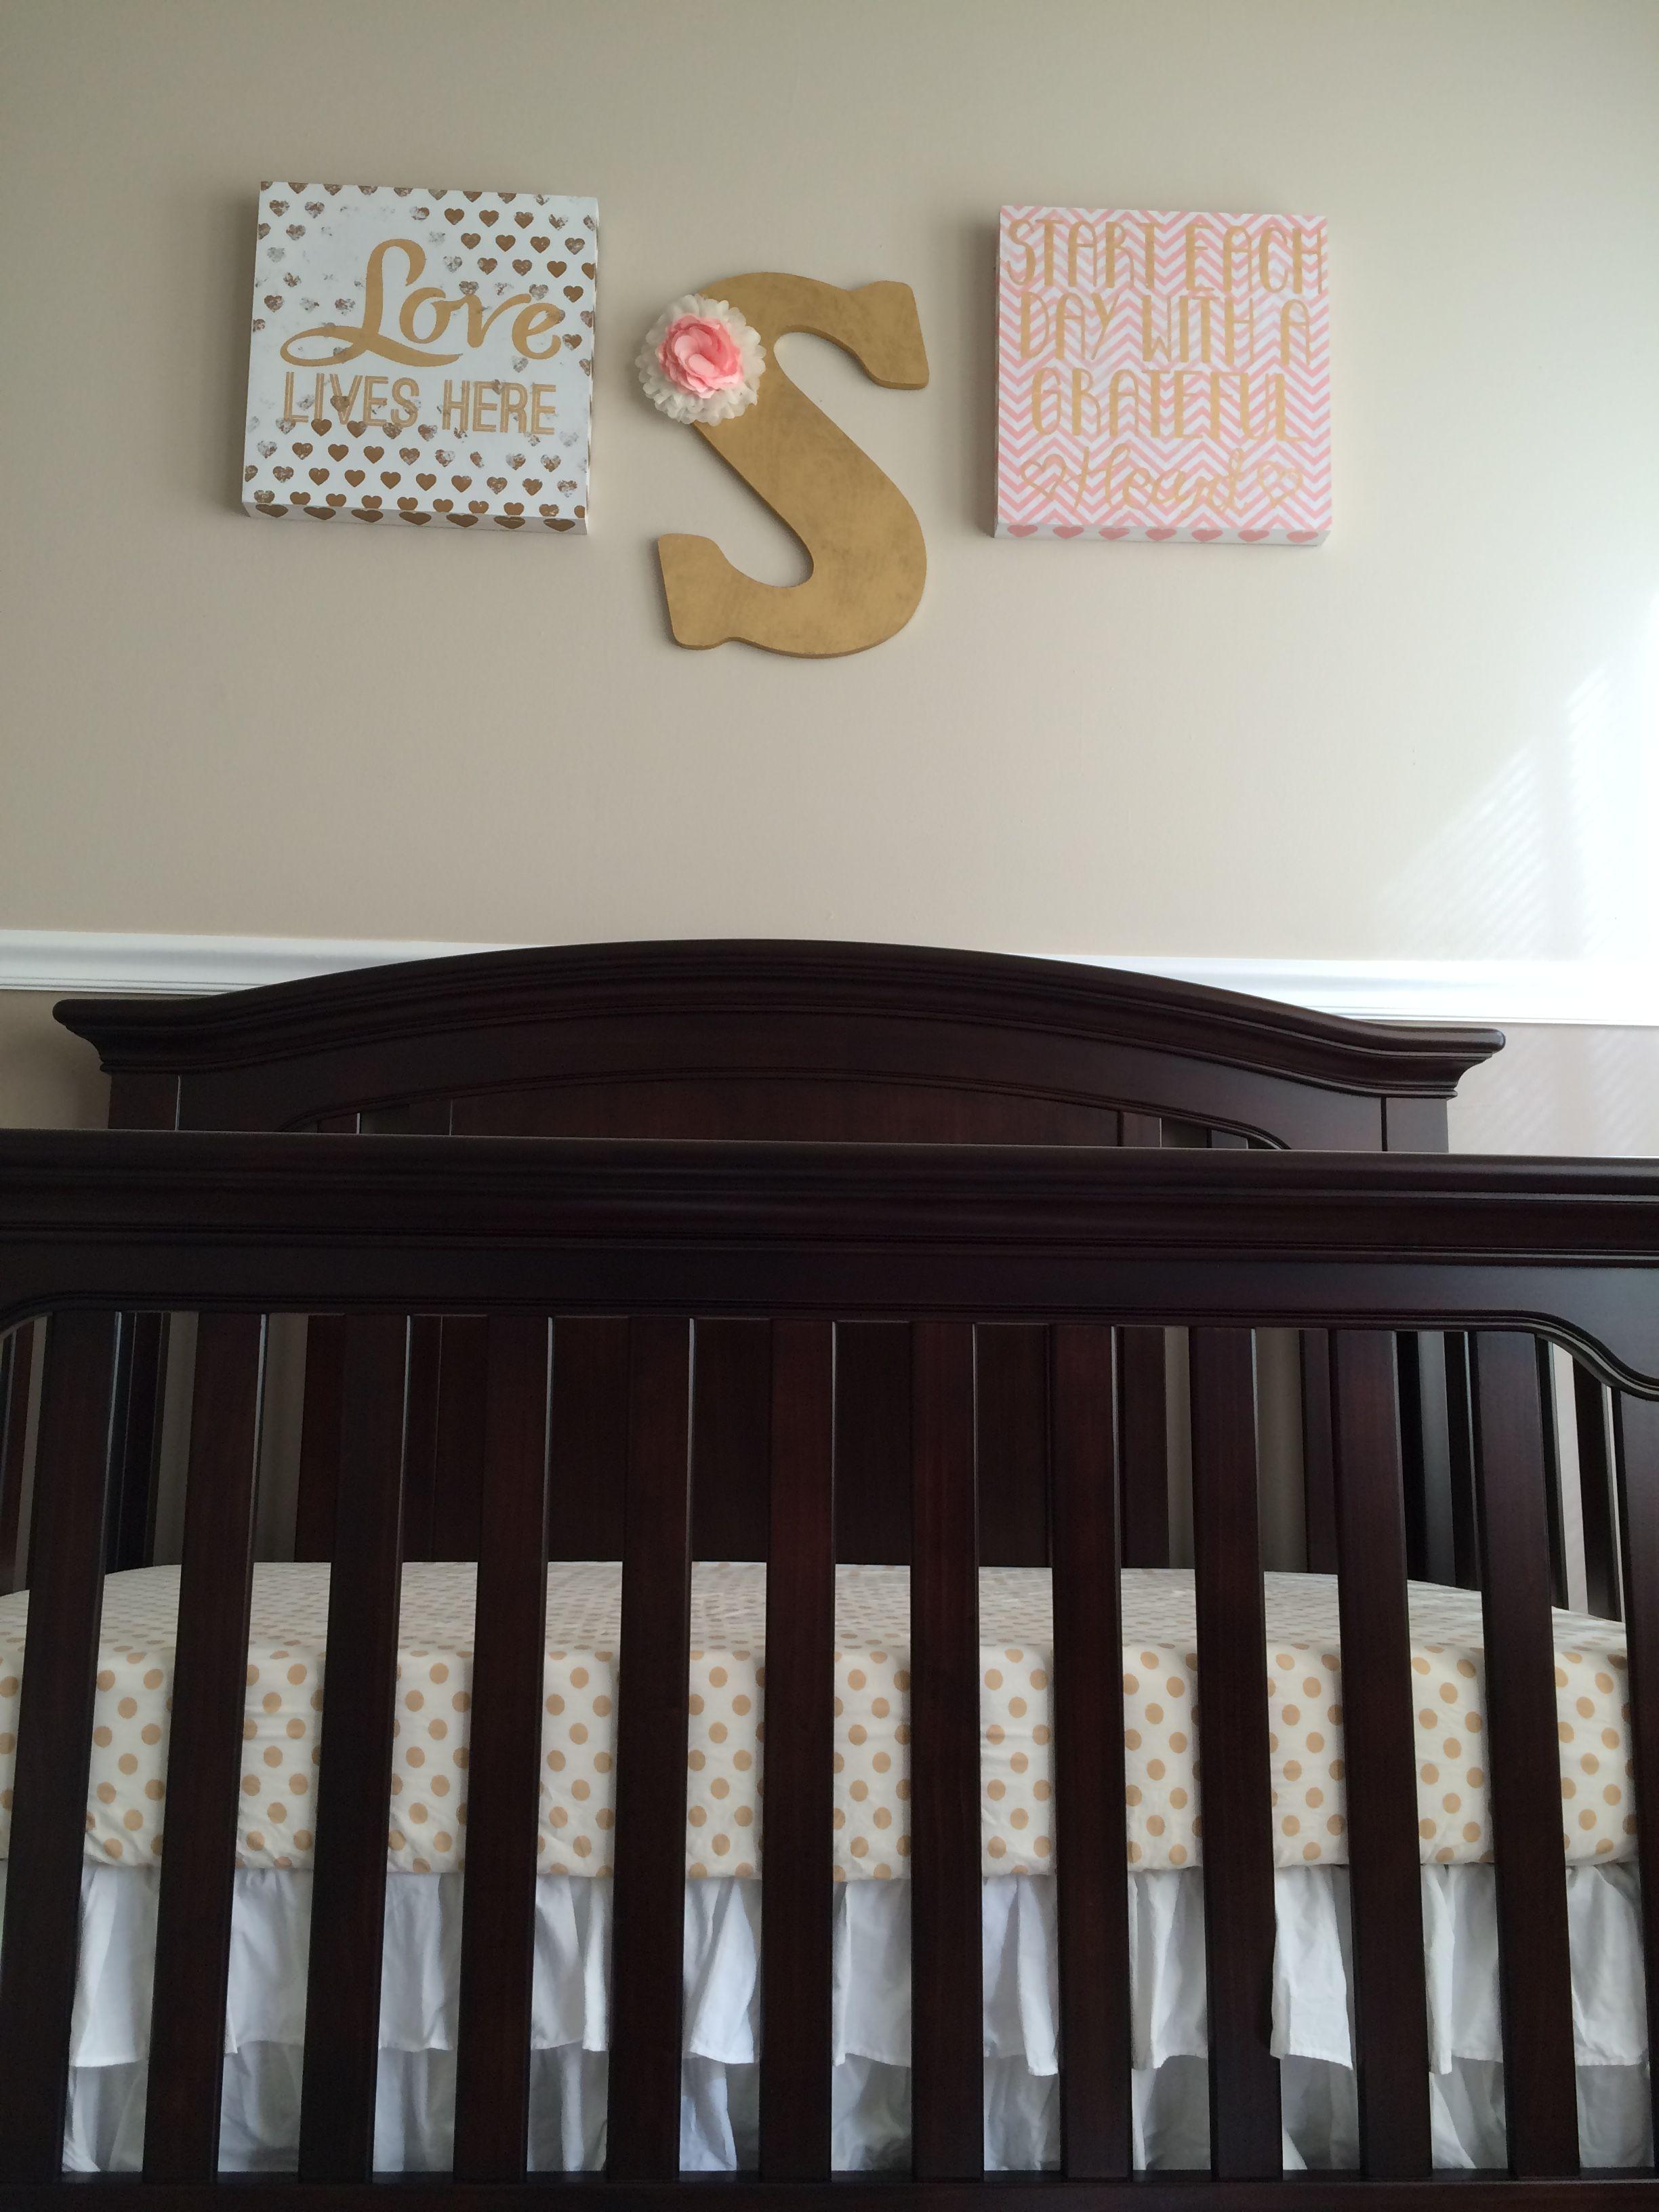 Baby Girl Nursery Golds, Pinks, Neutrals #nursery #babygirl #babygirlnursery #pink #pinkandgold #neutralnursery #girlnursery #sage #sagemichael